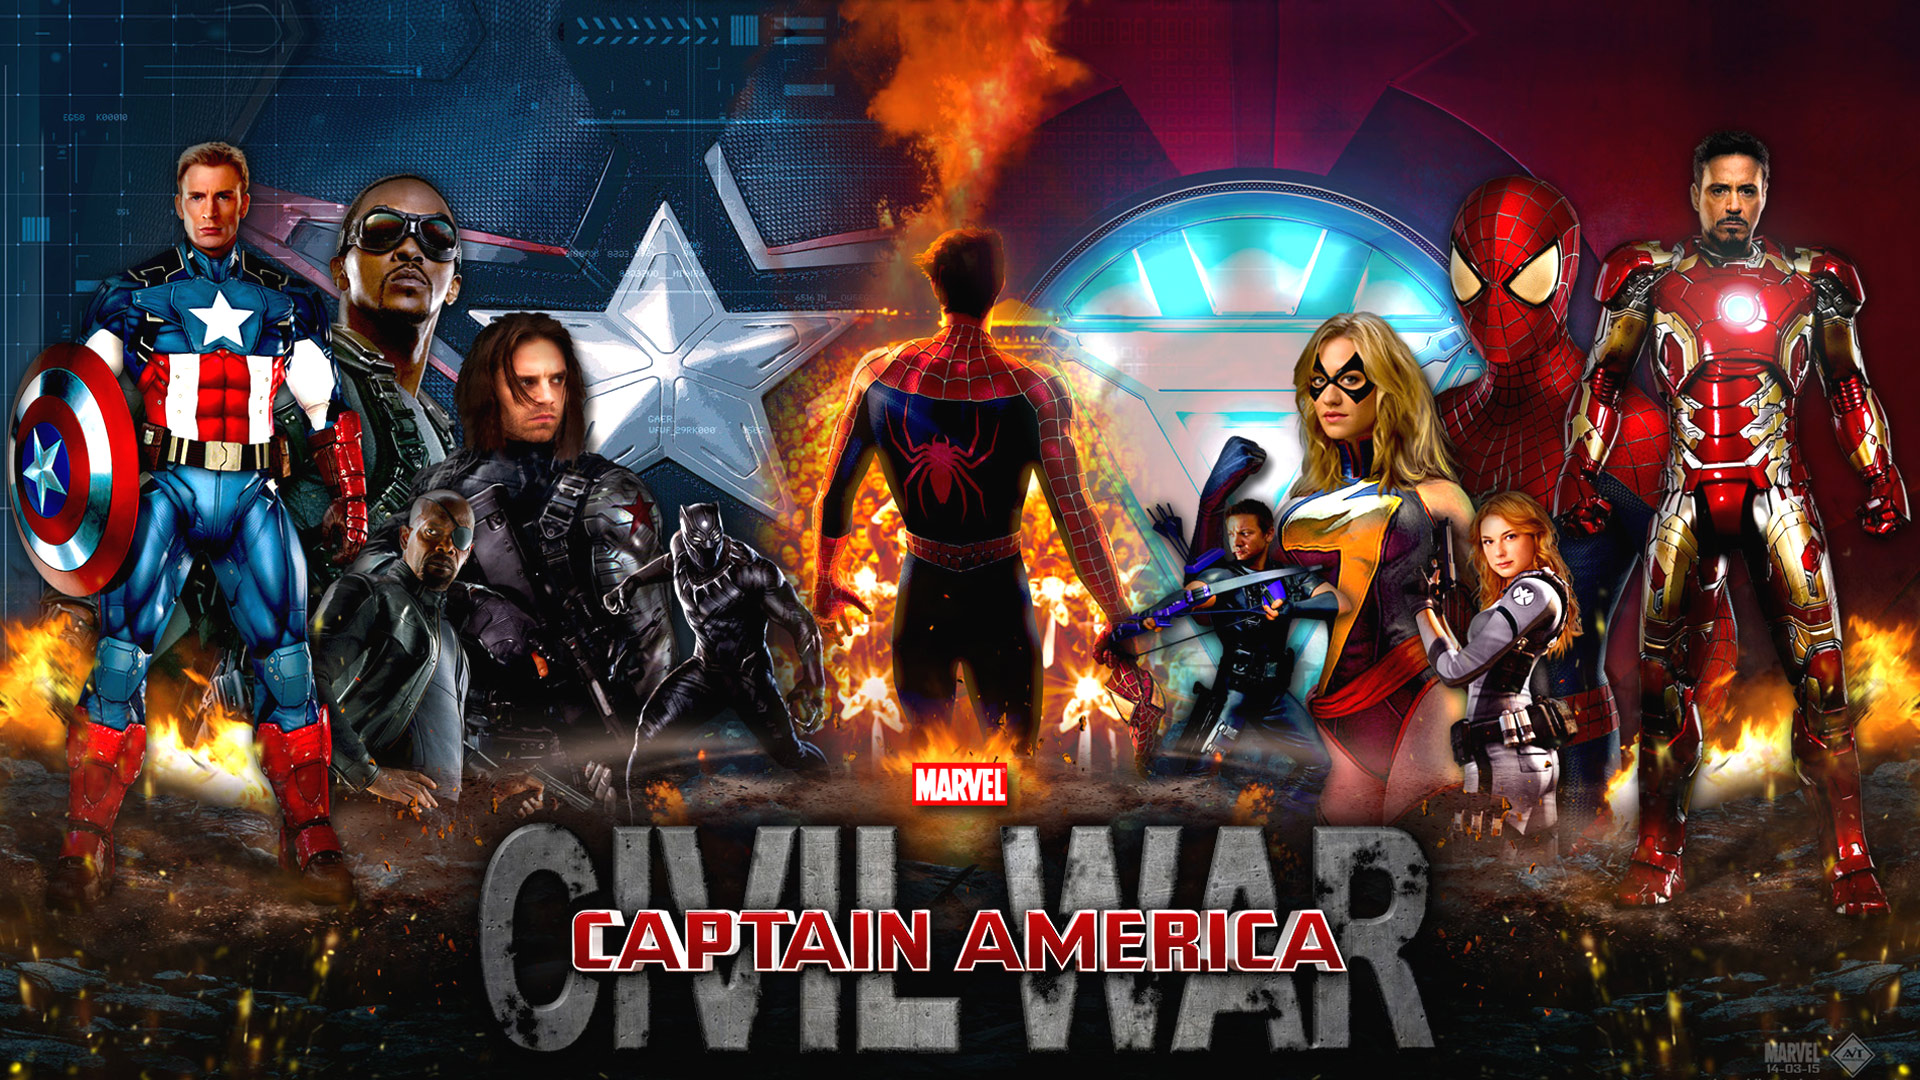 Captain America Civil War Wallpaper 1080p High Resolution Wallpaper 1920x1080